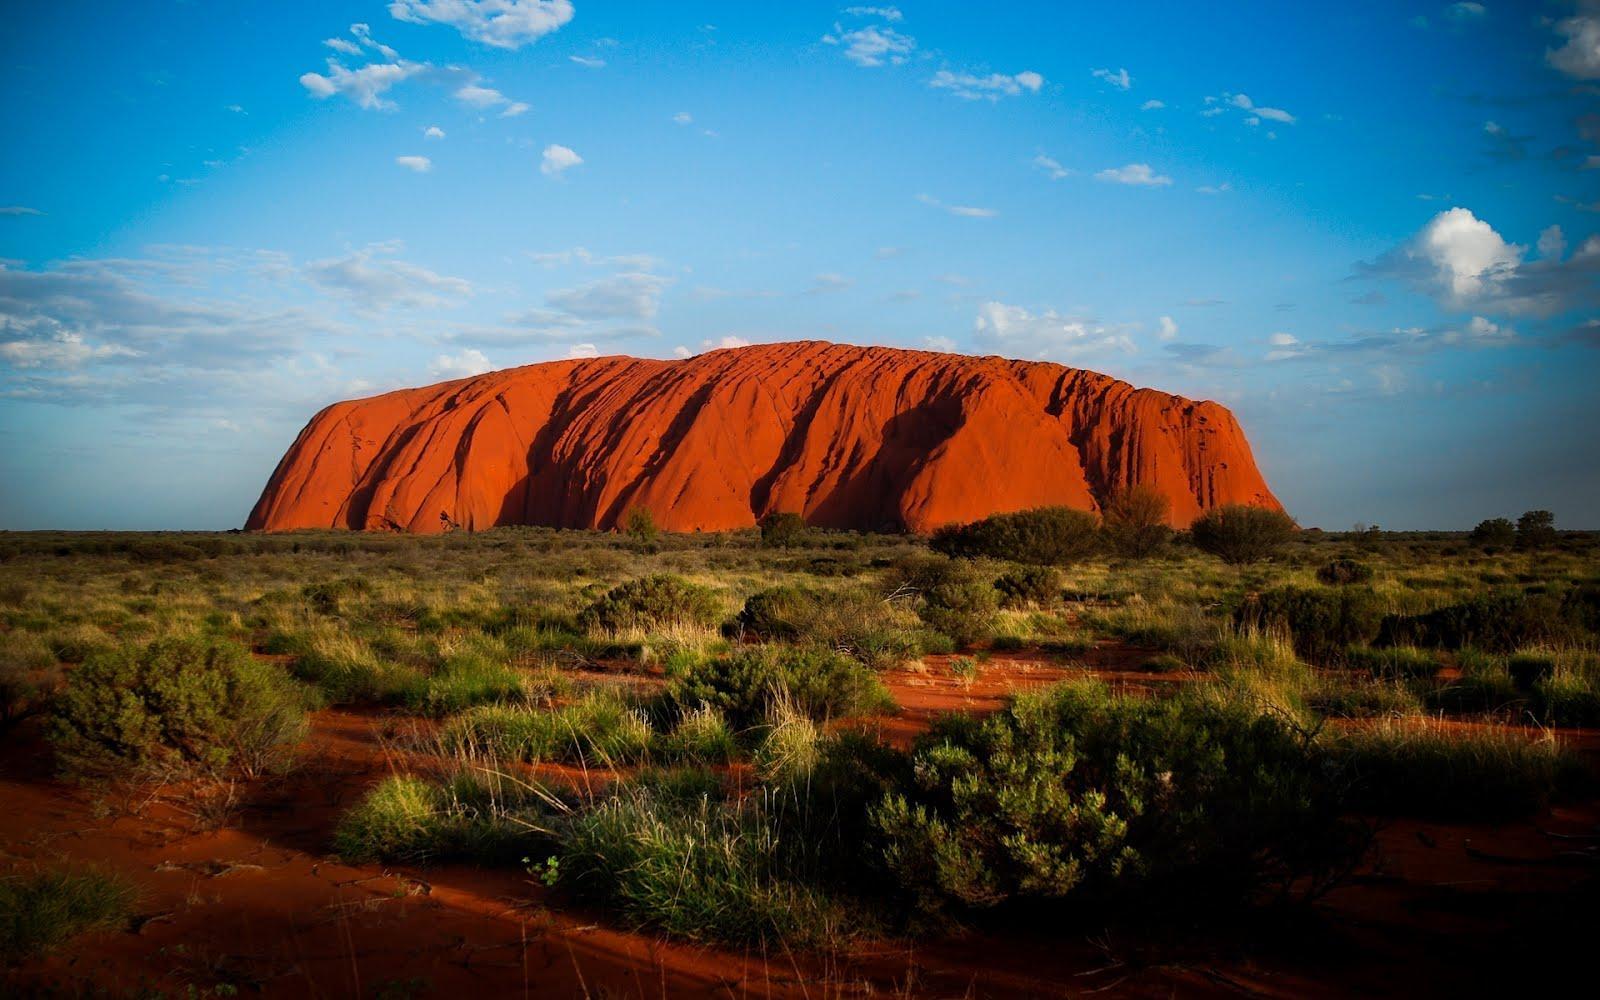 Big uluru australia